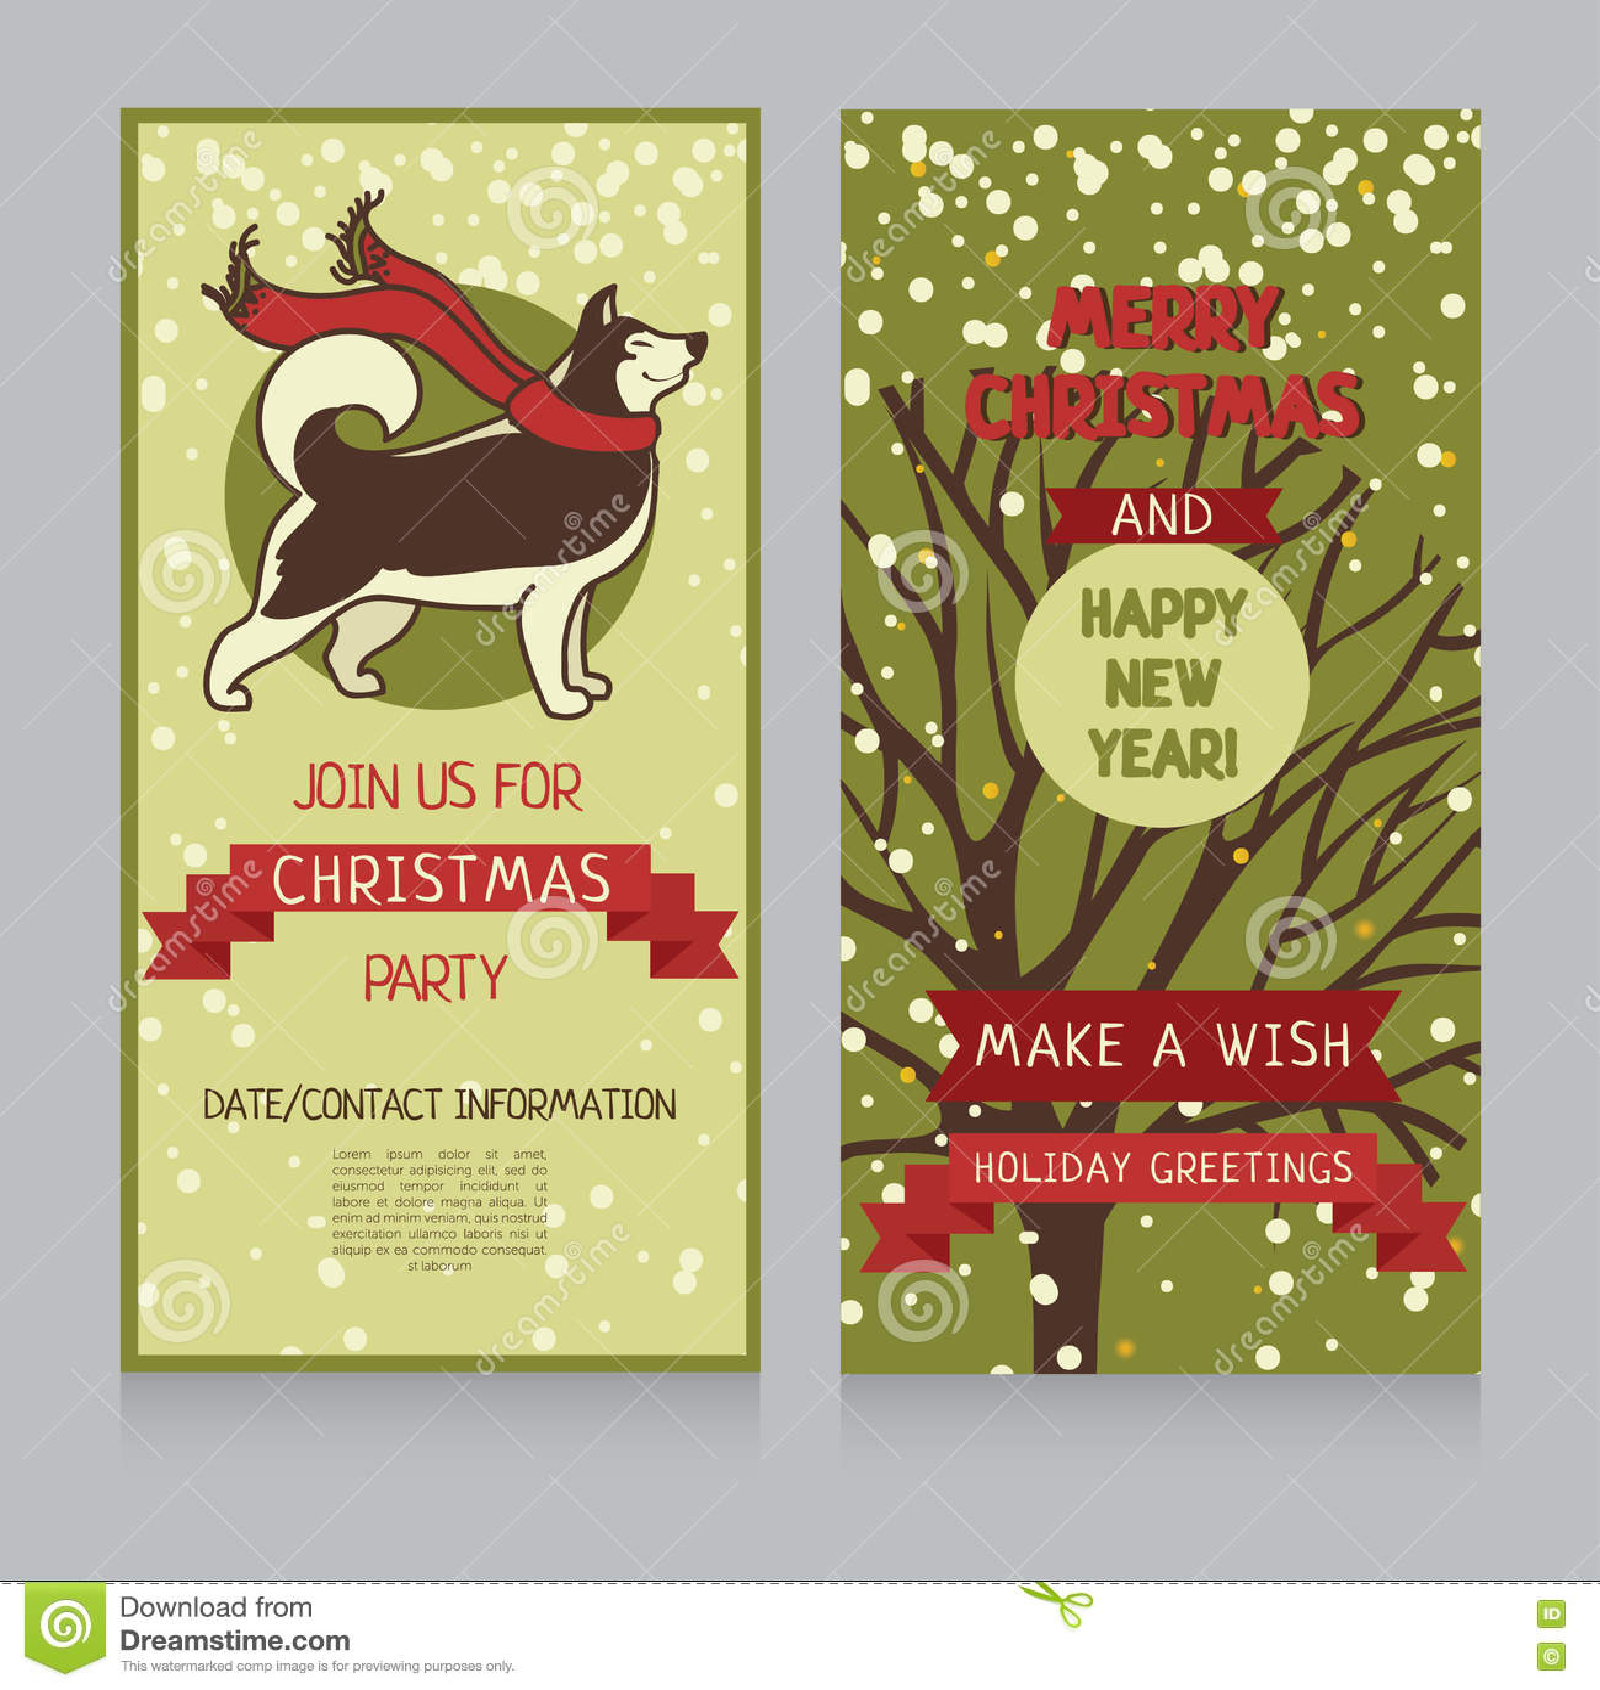 Husky Christmas Cards.Christmas Greeting Cards With Cute Husky Stock Vector